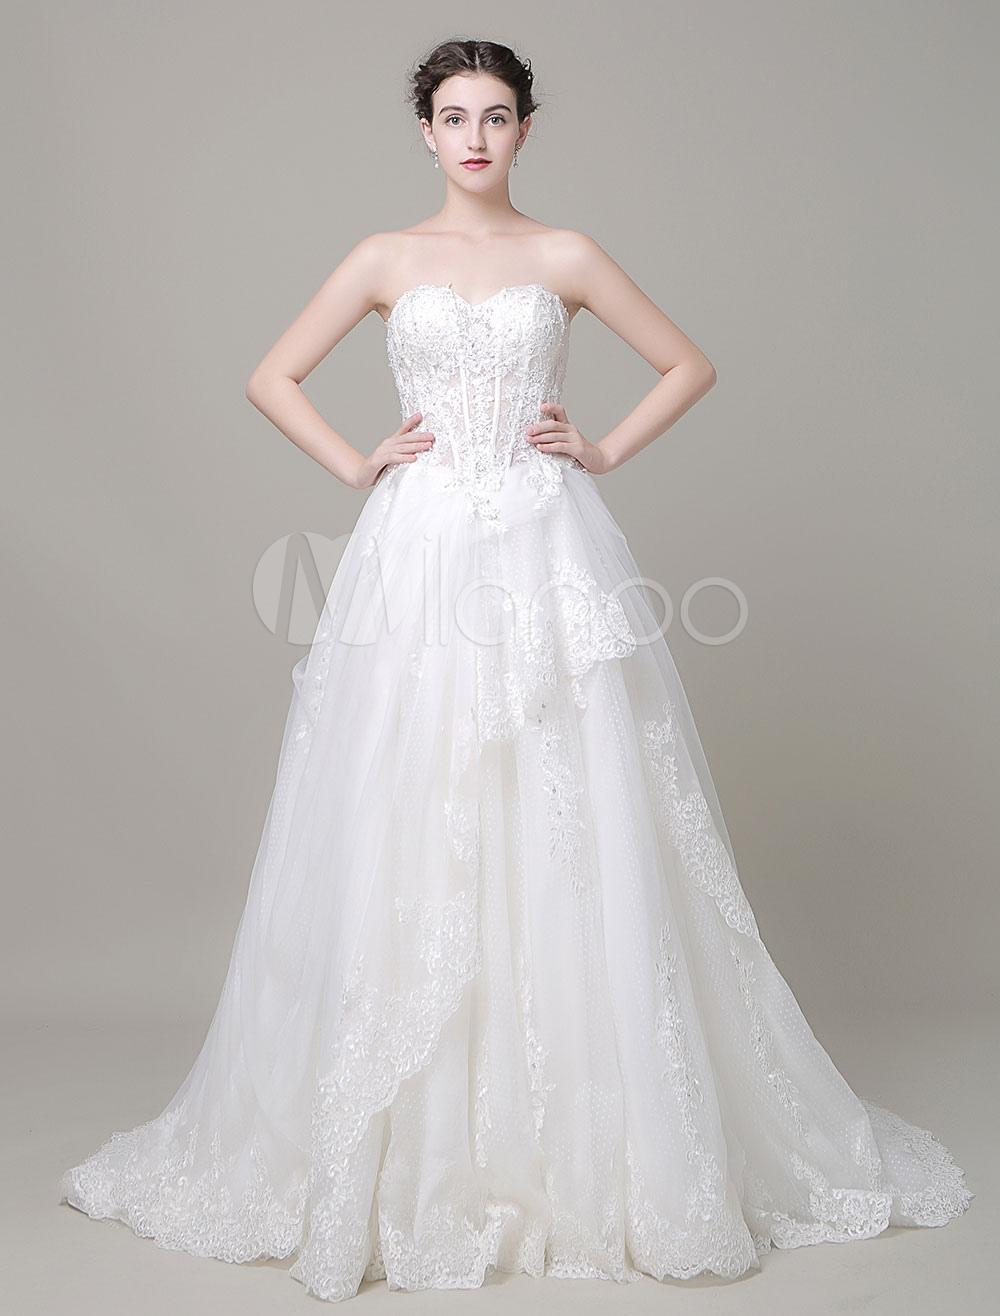 Sweetheart Wedding Dress A-Line Beading Lace Applique Court Train Bridal Dress